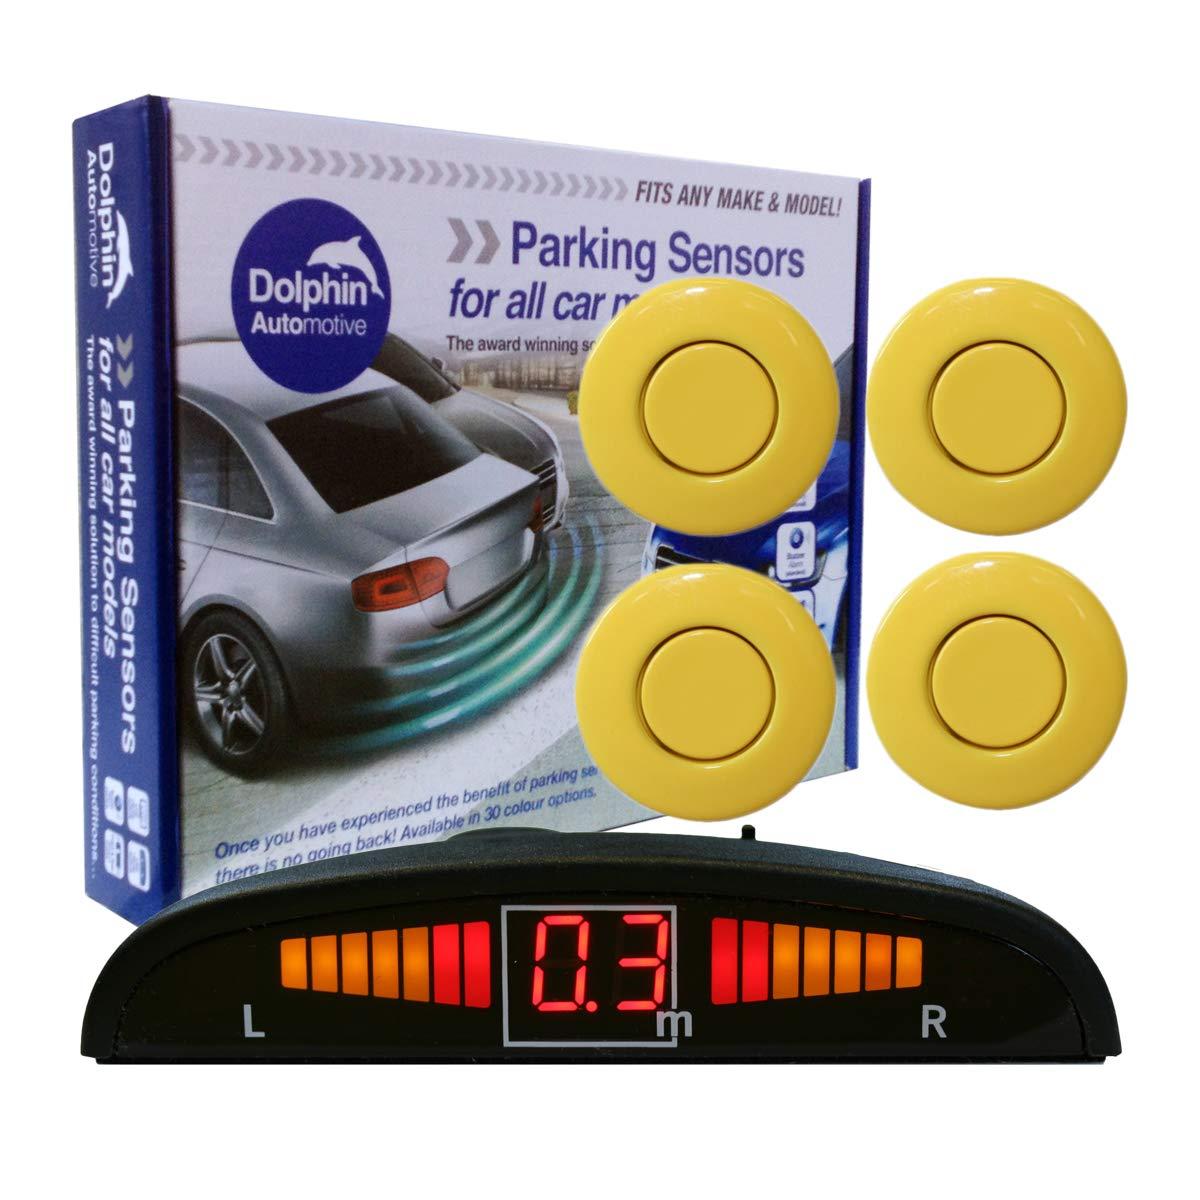 Black Dolphin DPS450 Reverse Parking Sensors In 32 Colours 4 Ultrasonic Radar Sensors Kit Audio /& Display Alert System Matt /& Gloss Black 30 More Colours